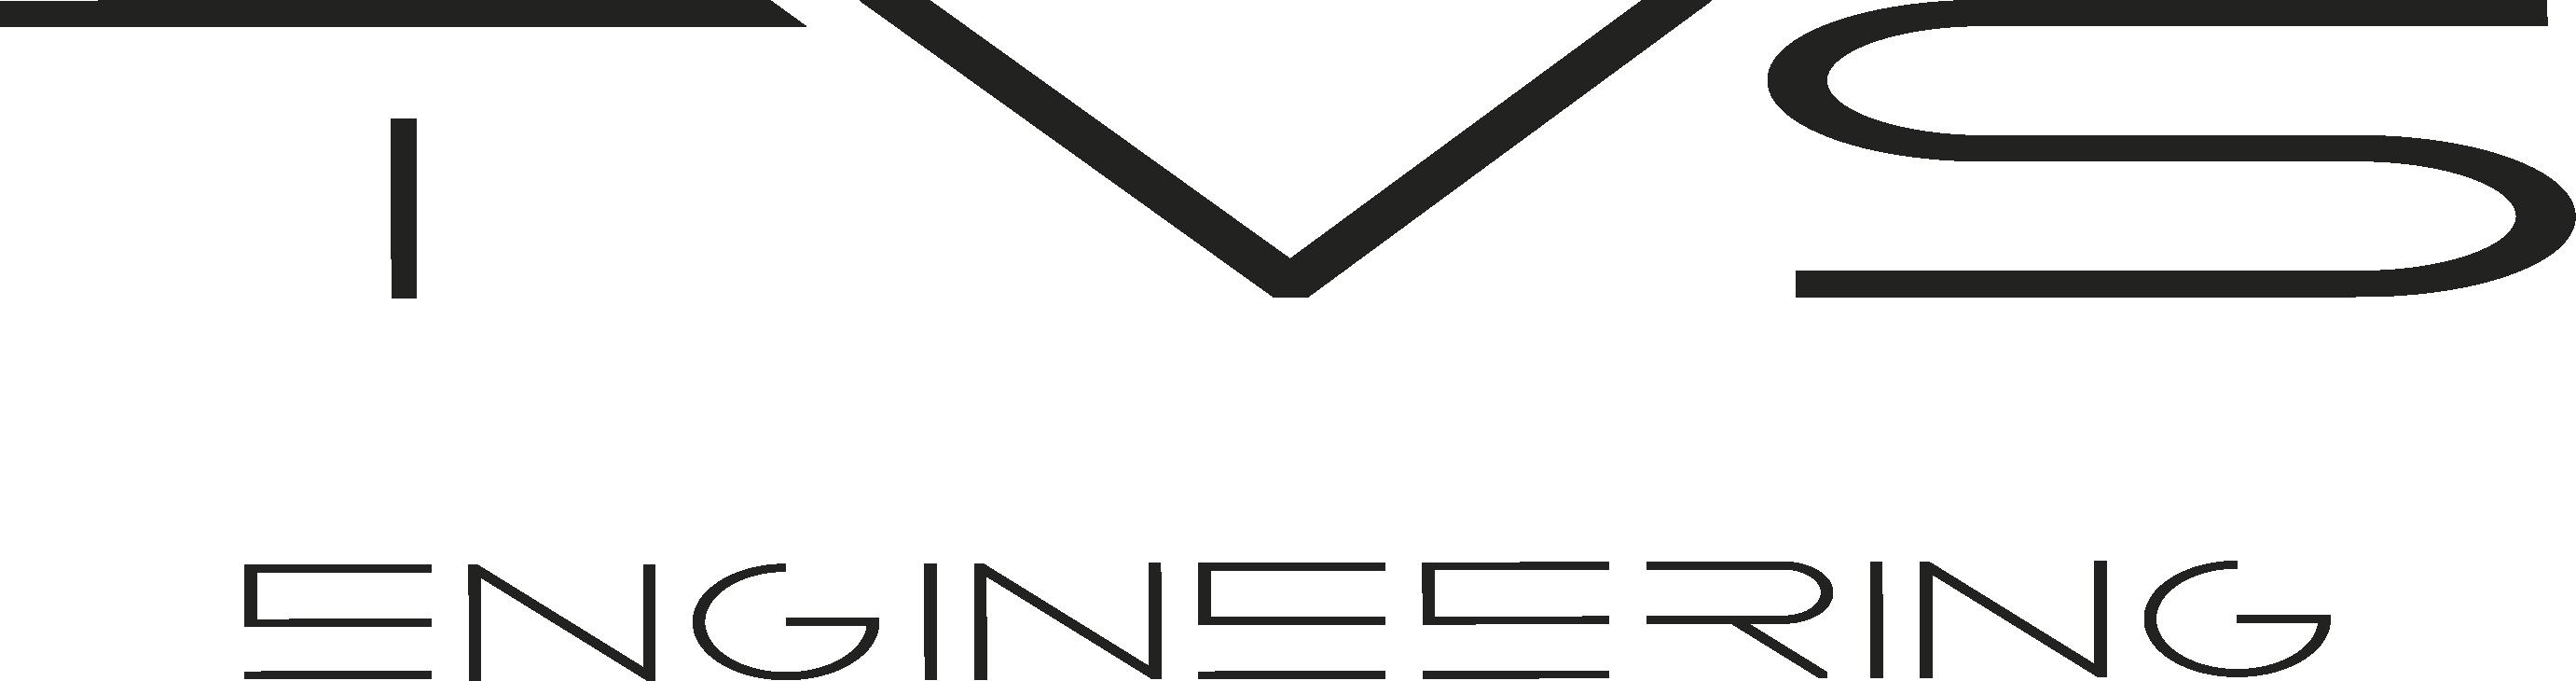 tvs-logo-black-transparant.png